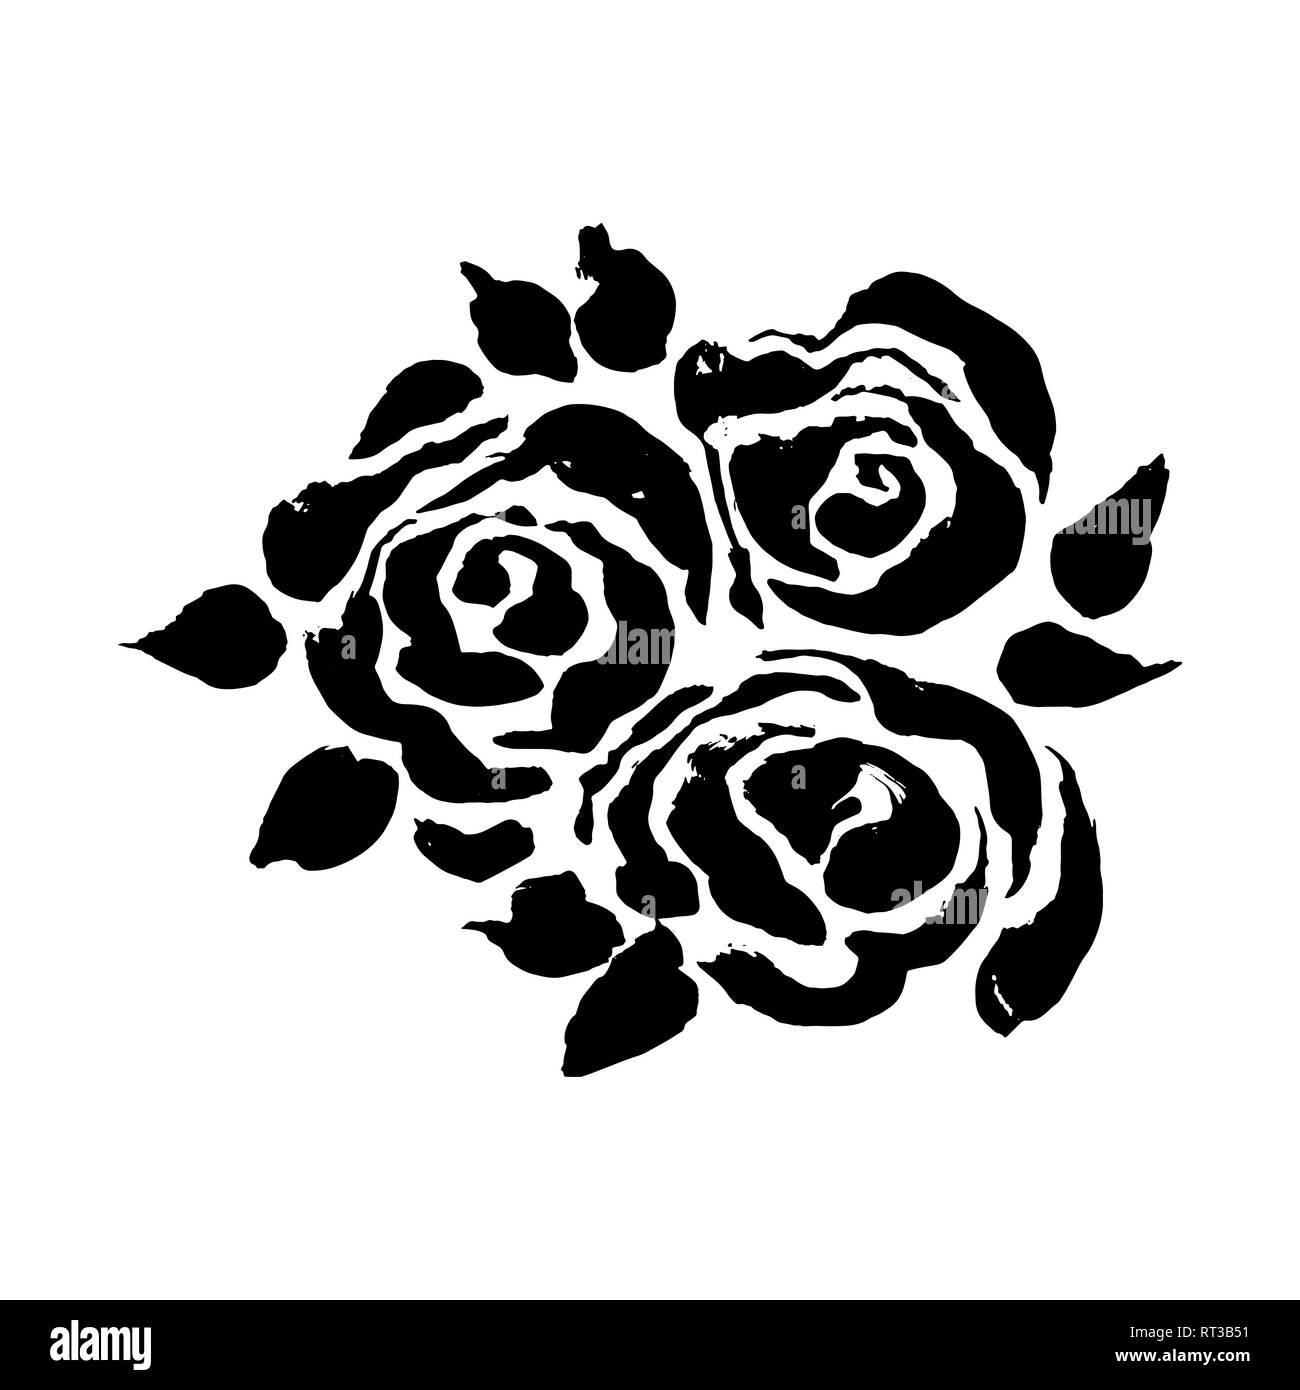 Abstract Grunge Ink Flower Background Roses Black Brush